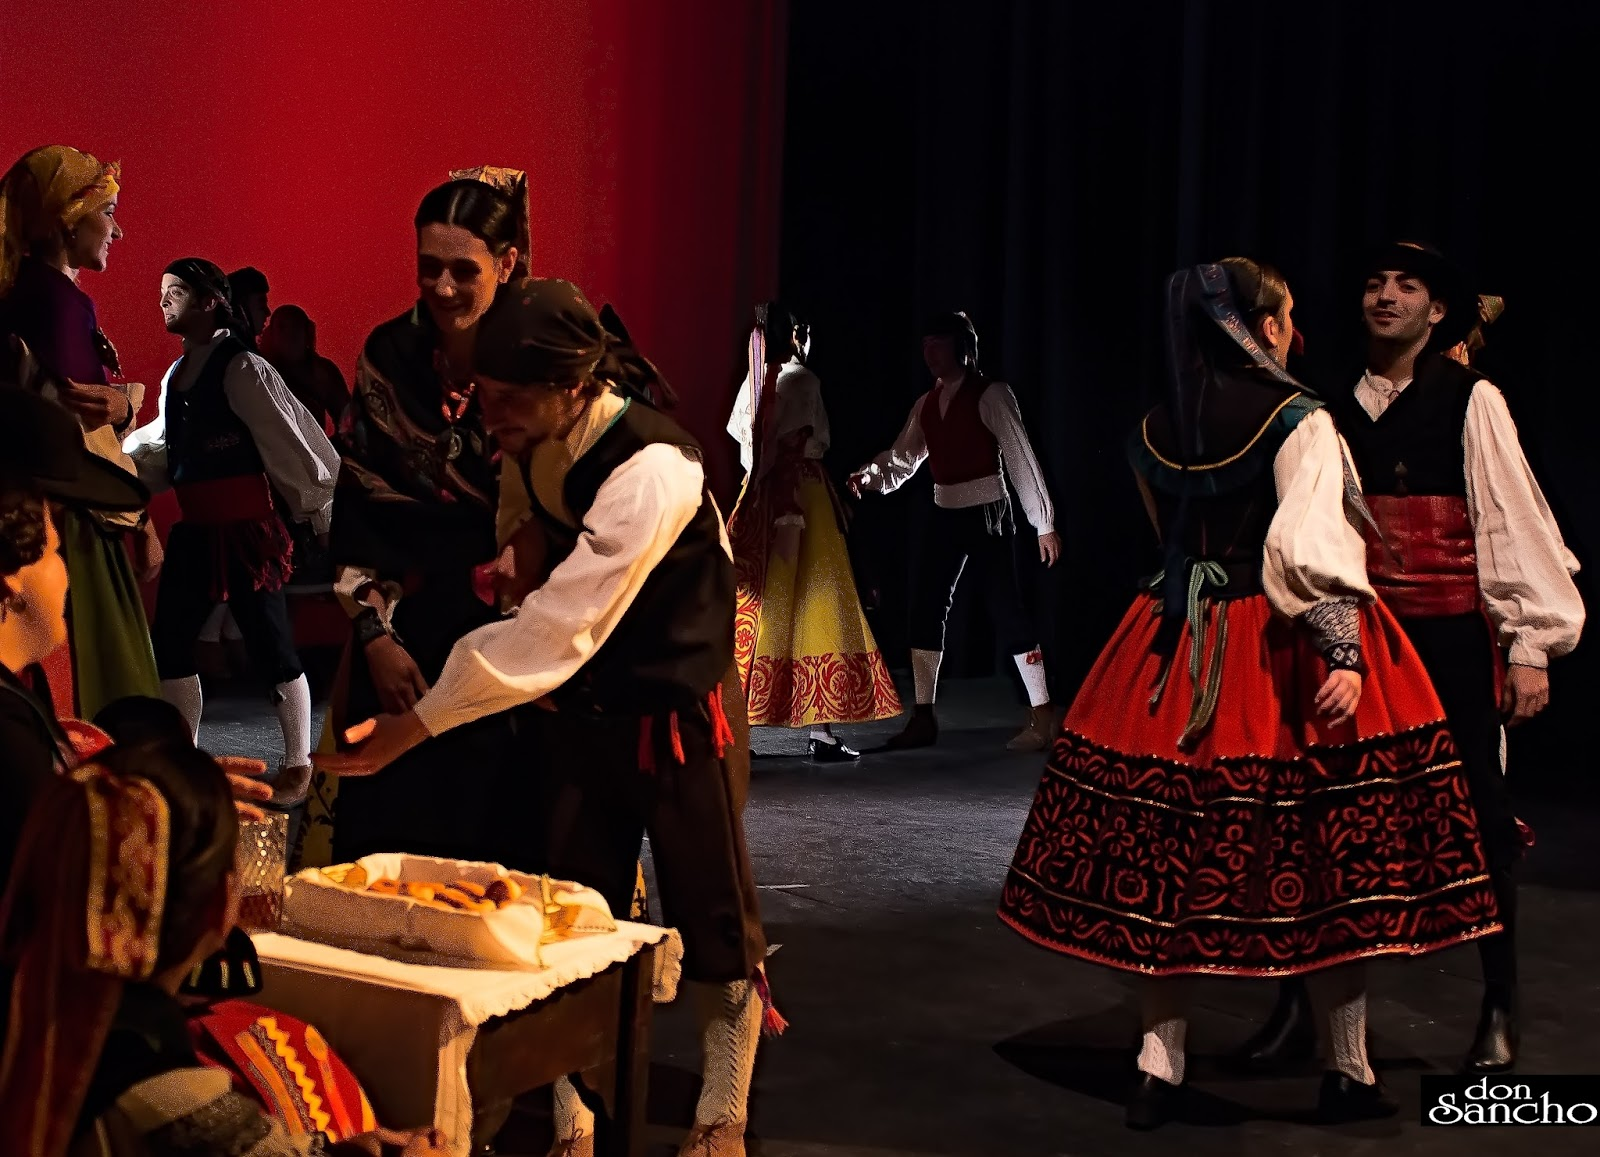 DON SANCHO. Difusión de la Cultura Tradicional de Zamora ... - photo#37